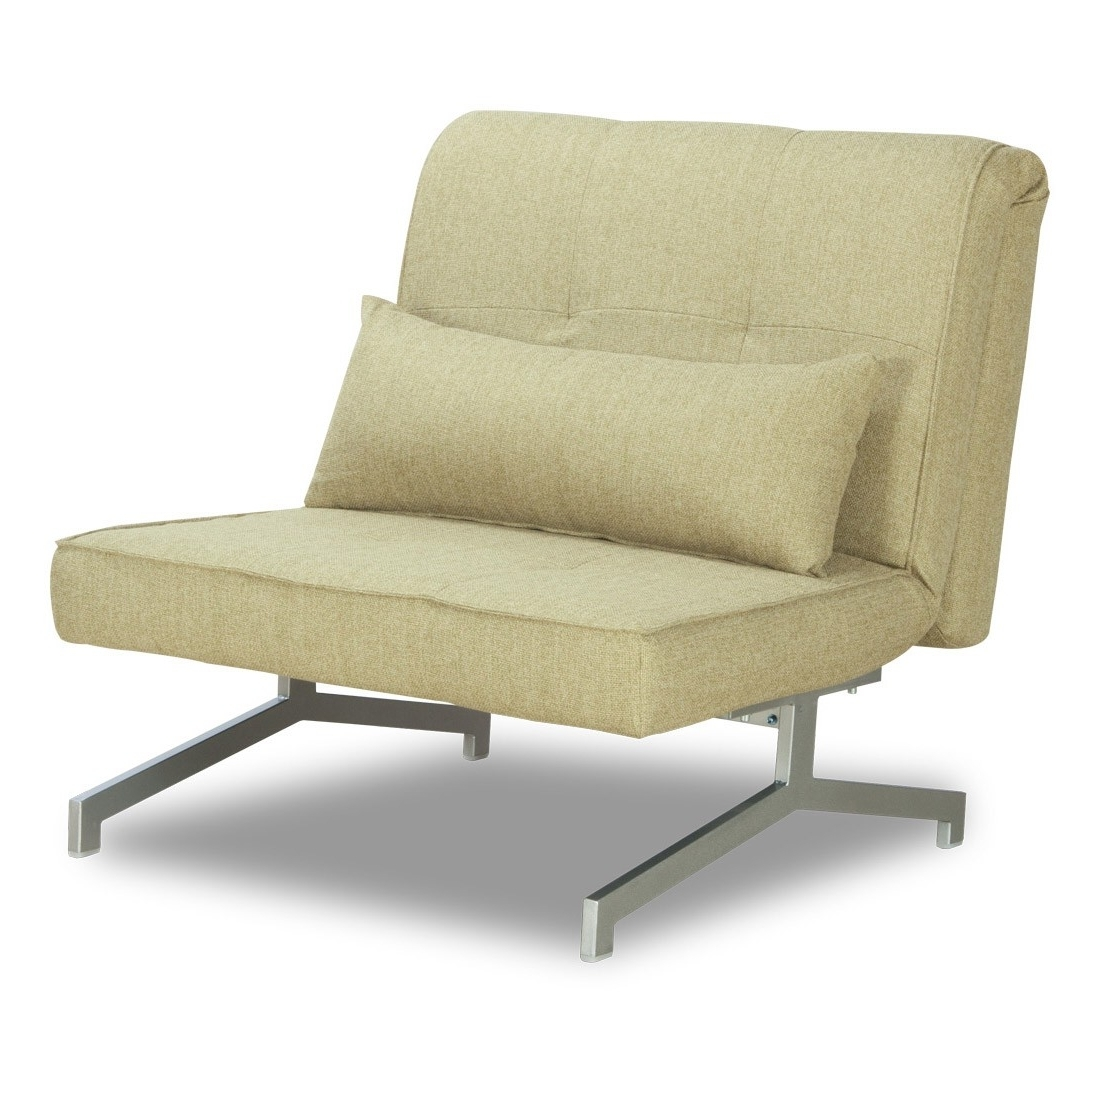 Single Seat Sofa Chairs Within Fashionable Single Chair Sofa Beds Uk – Surferoaxaca (View 9 of 20)